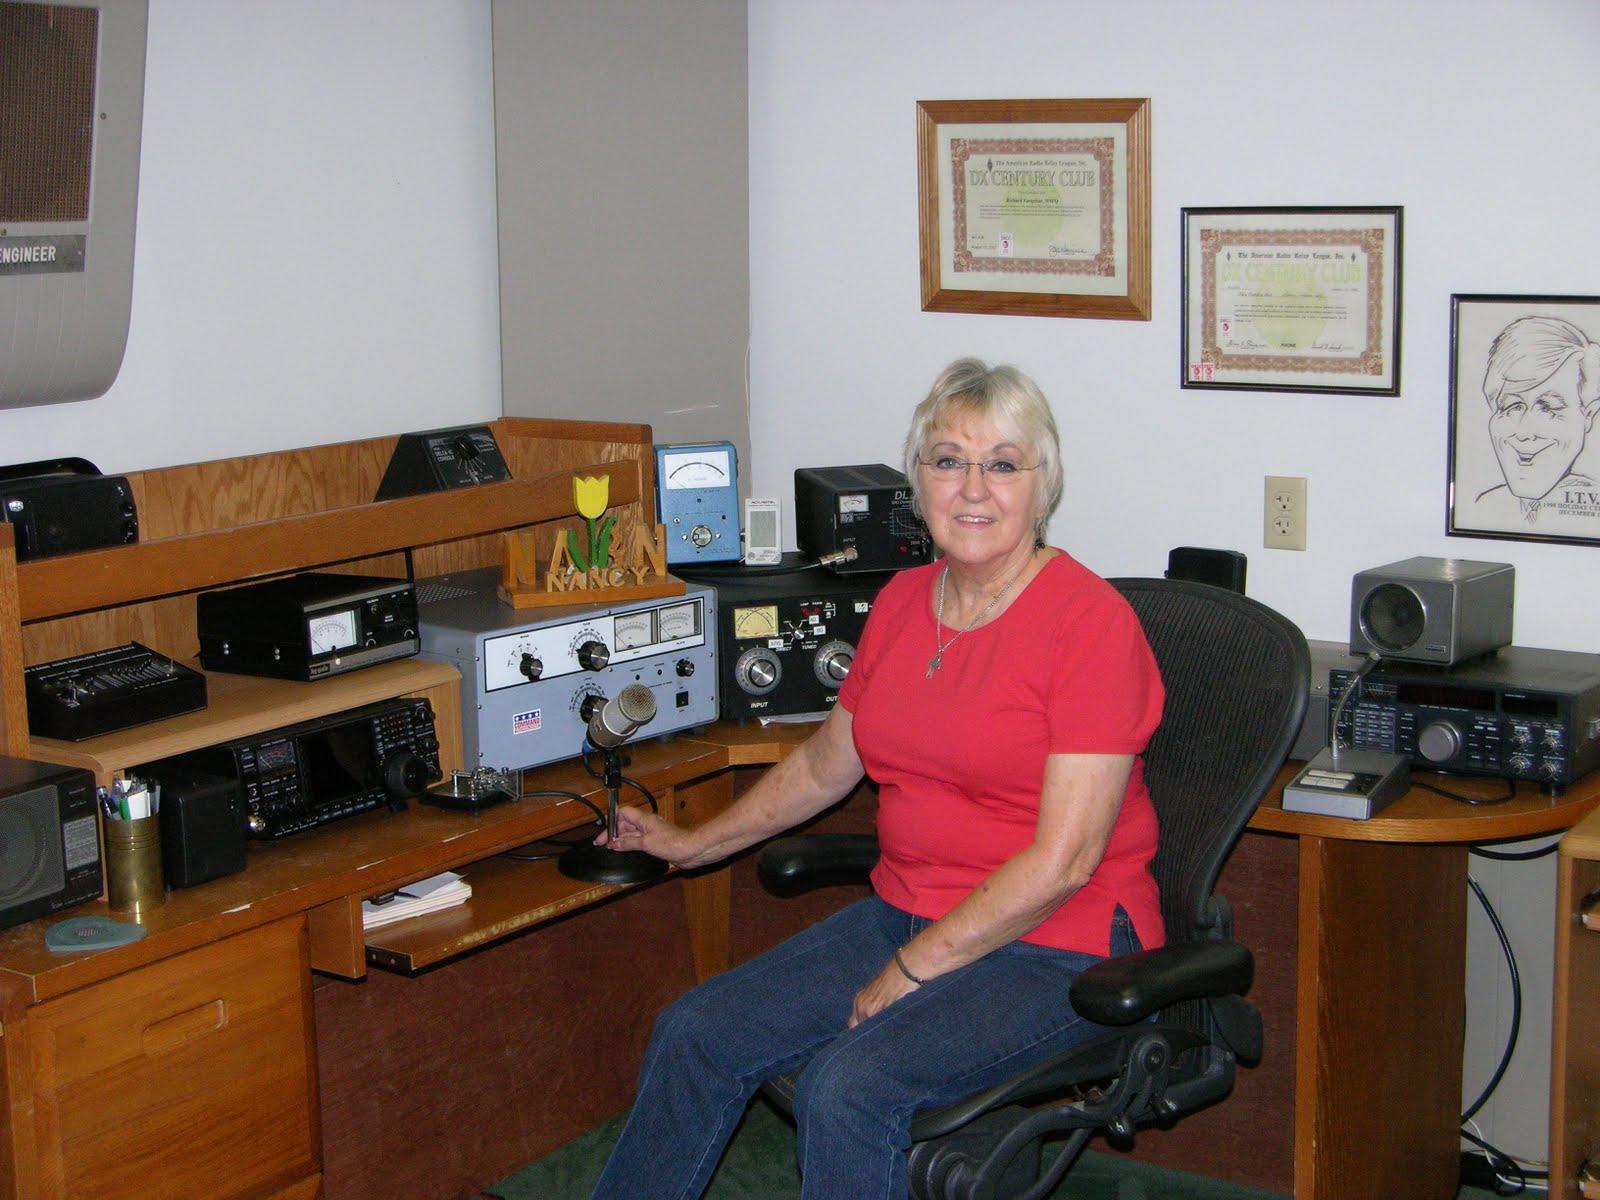 Amateur Radio Station Wb4omm: Helloroad: Updated Amateur Radio Station